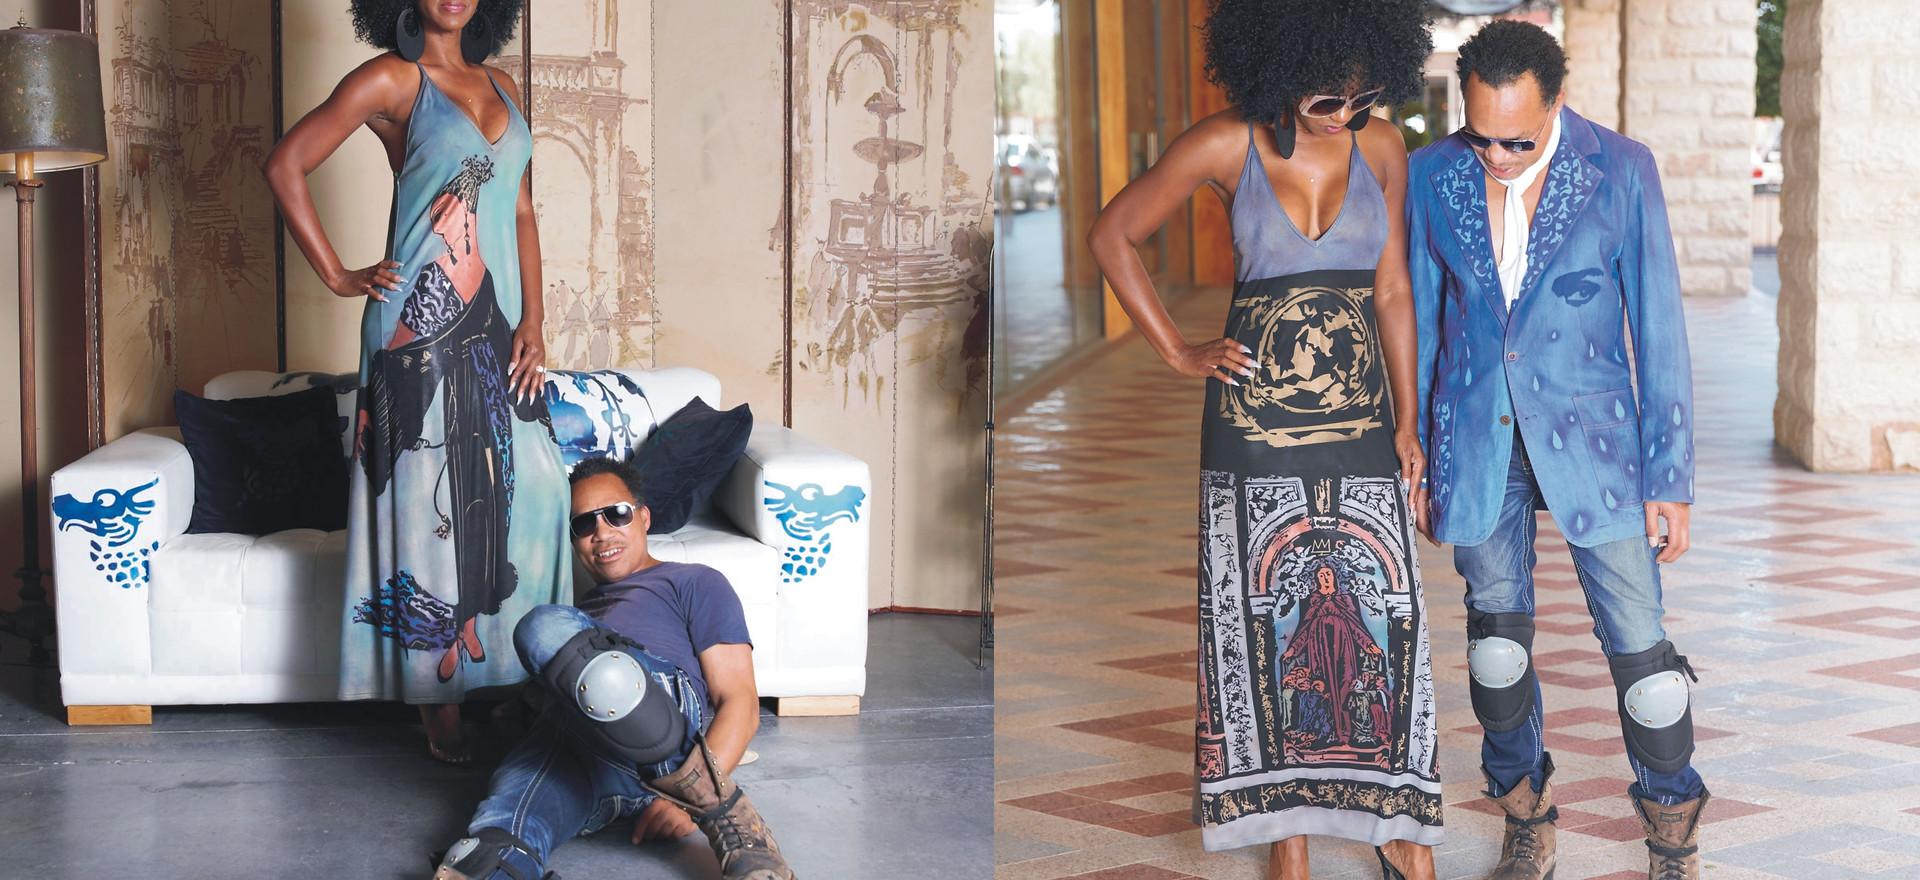 R:Arobia textile dress L: Famosa textile dress